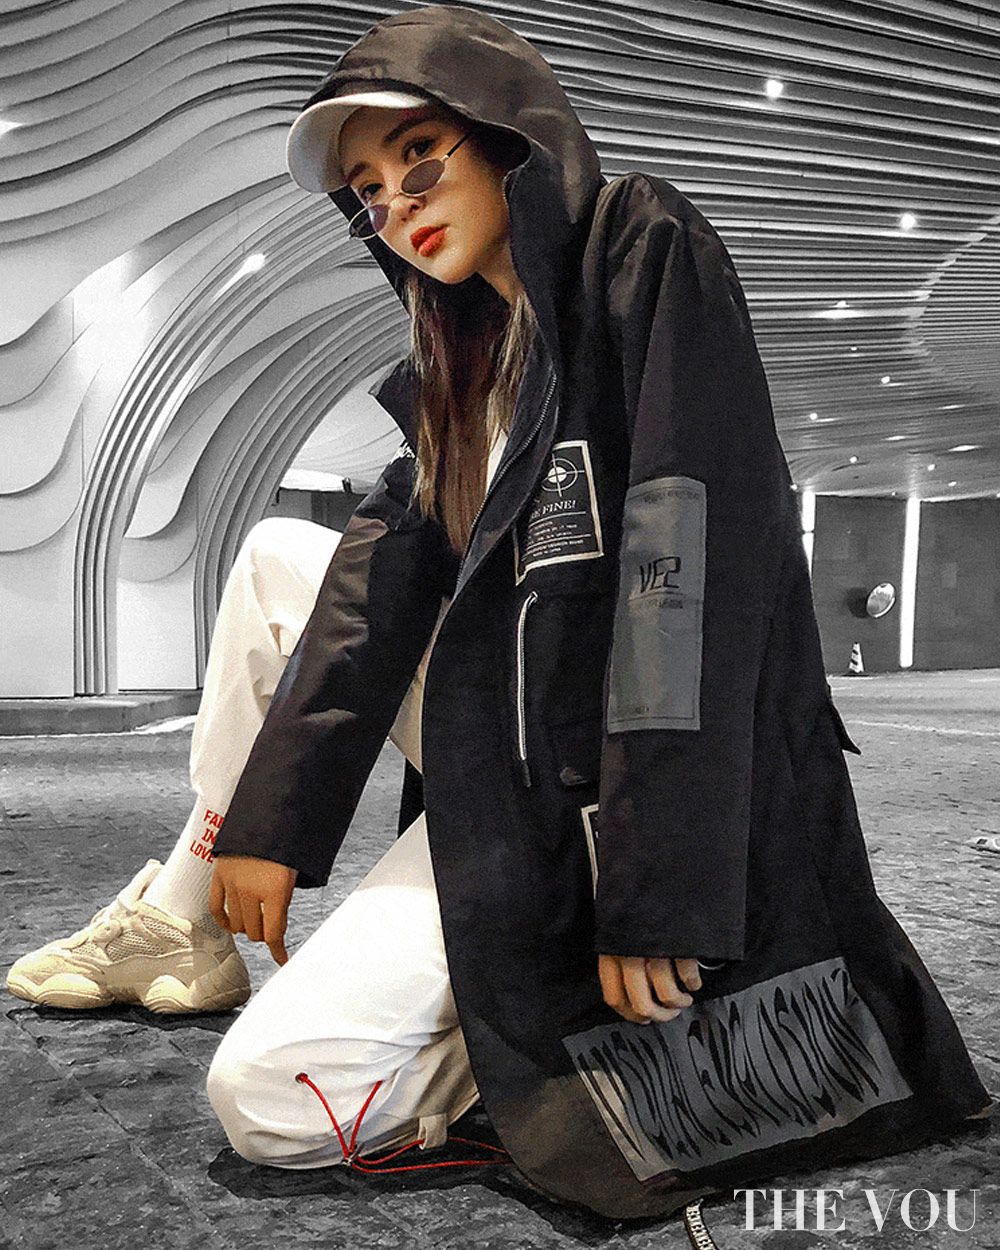 Raikago technical clothing for women